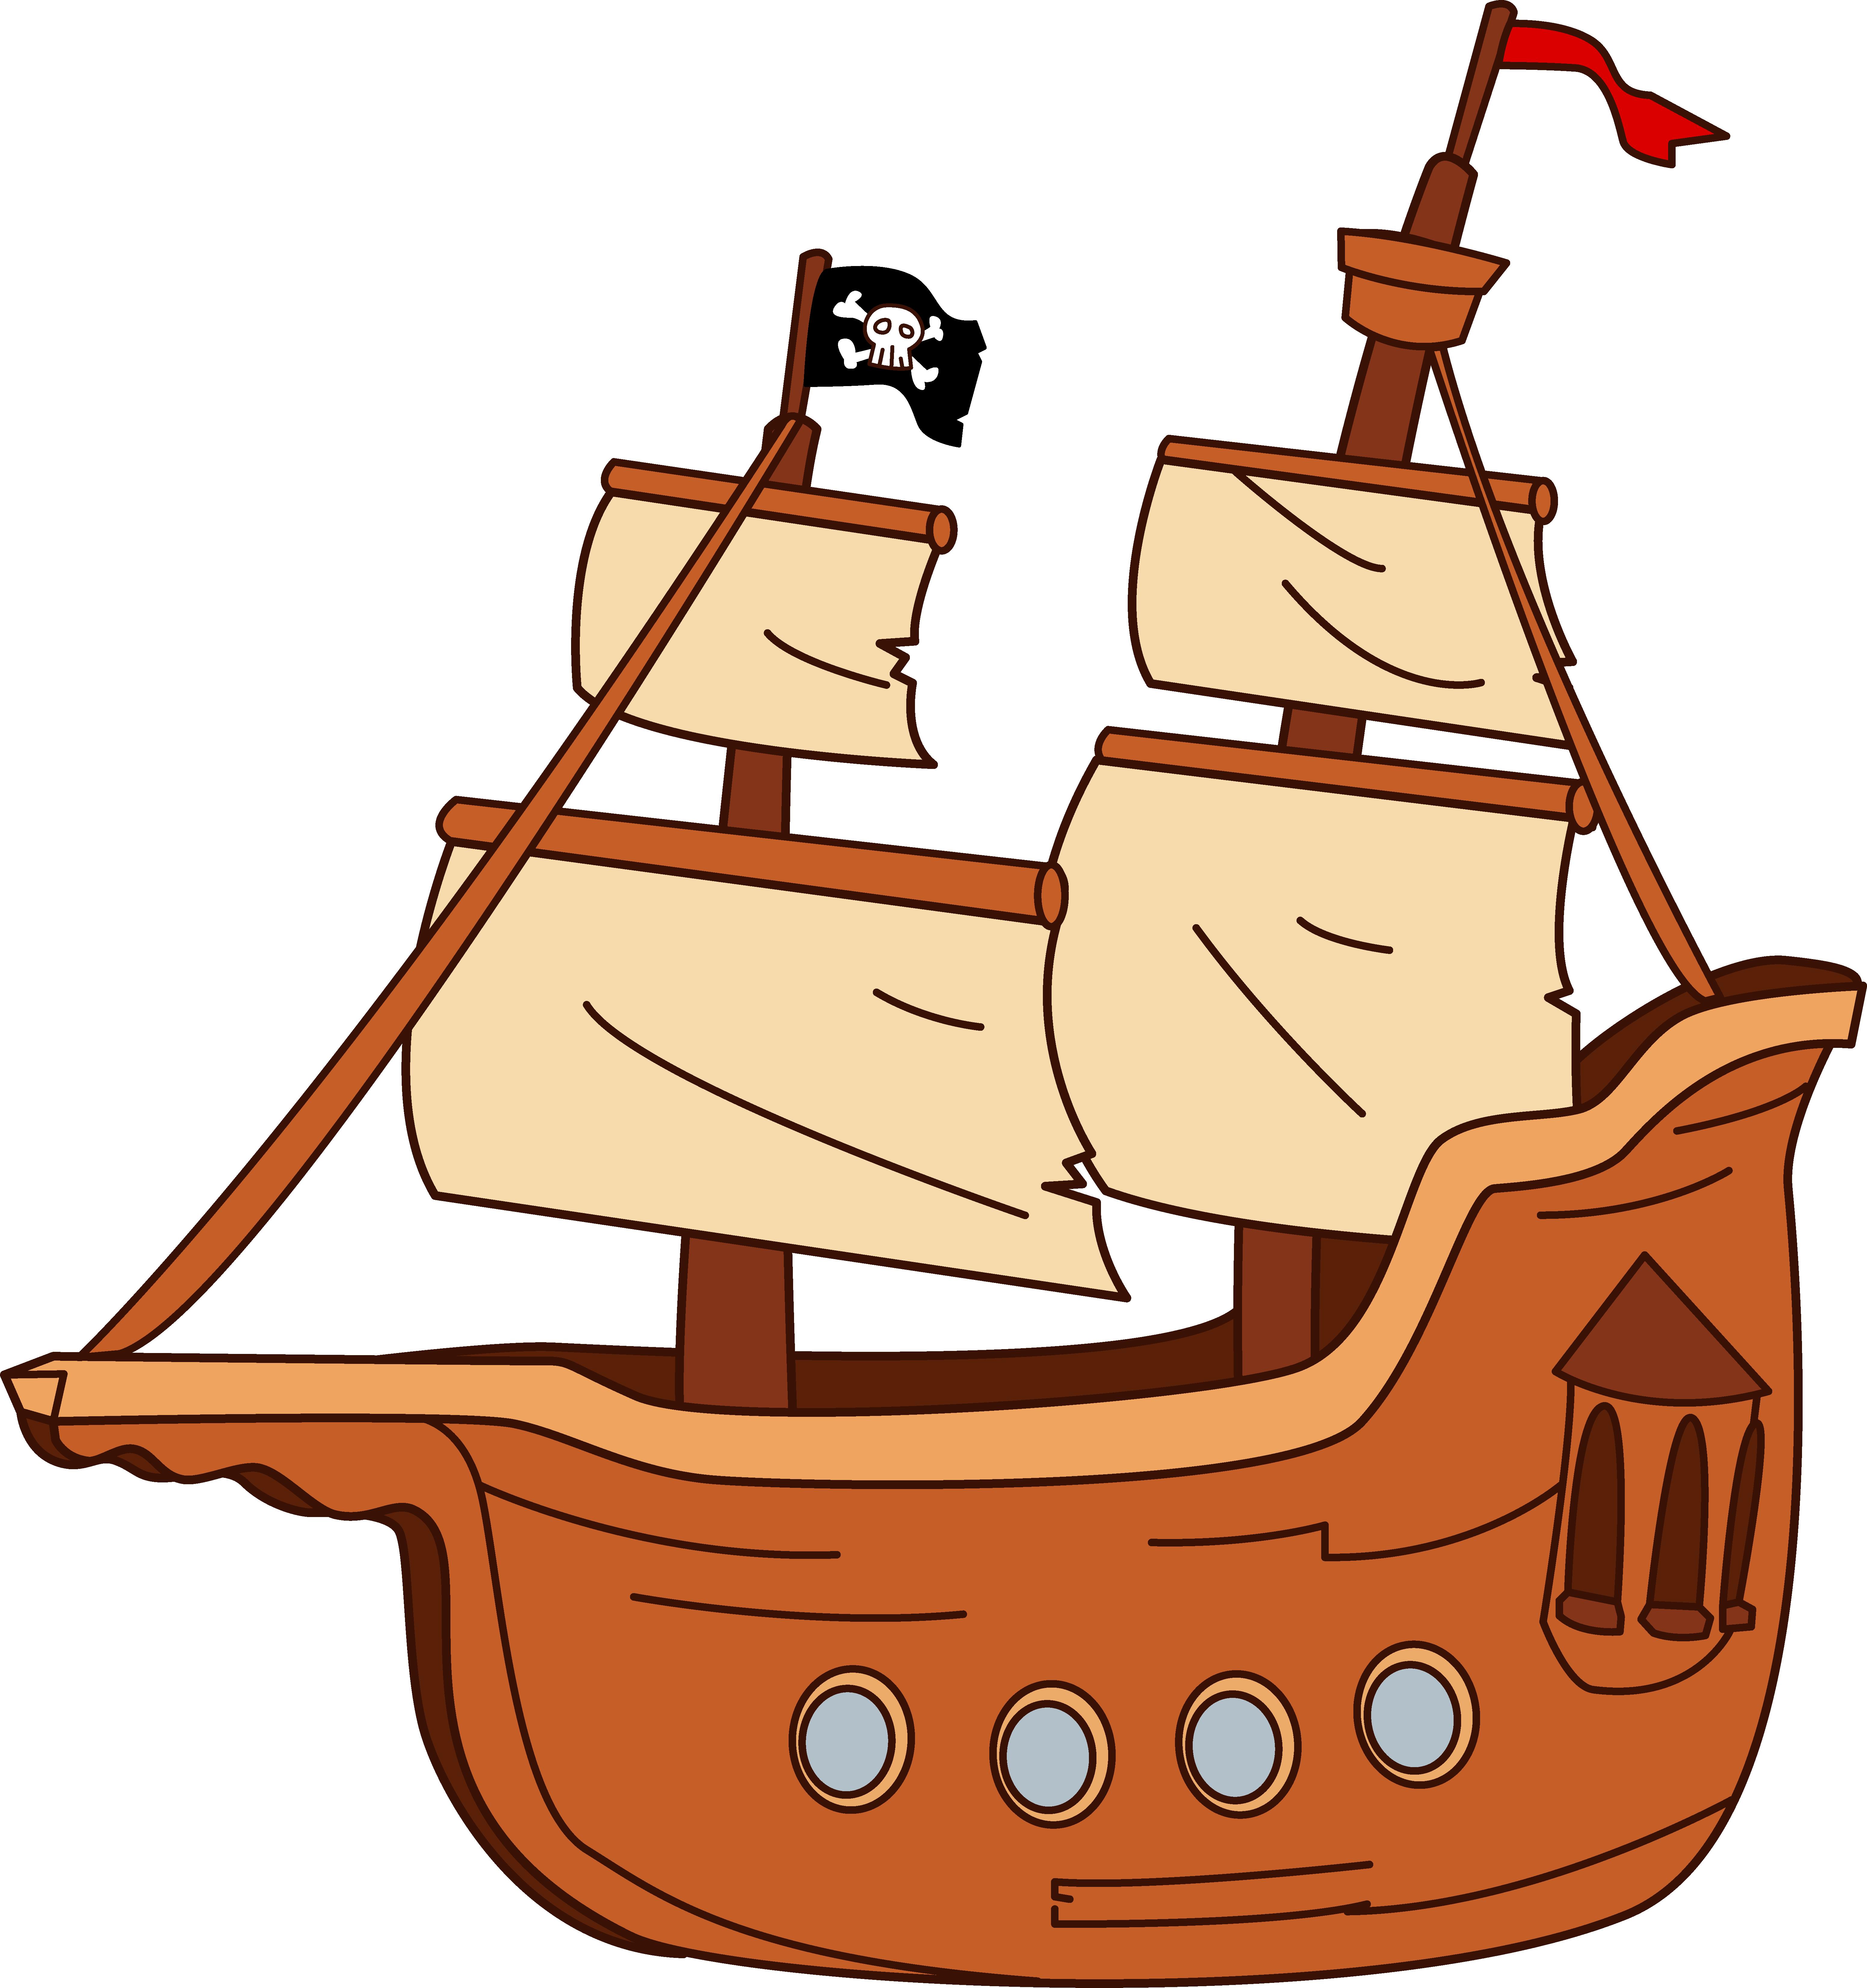 Boat clipart clipart-Boat clipart clipart-9